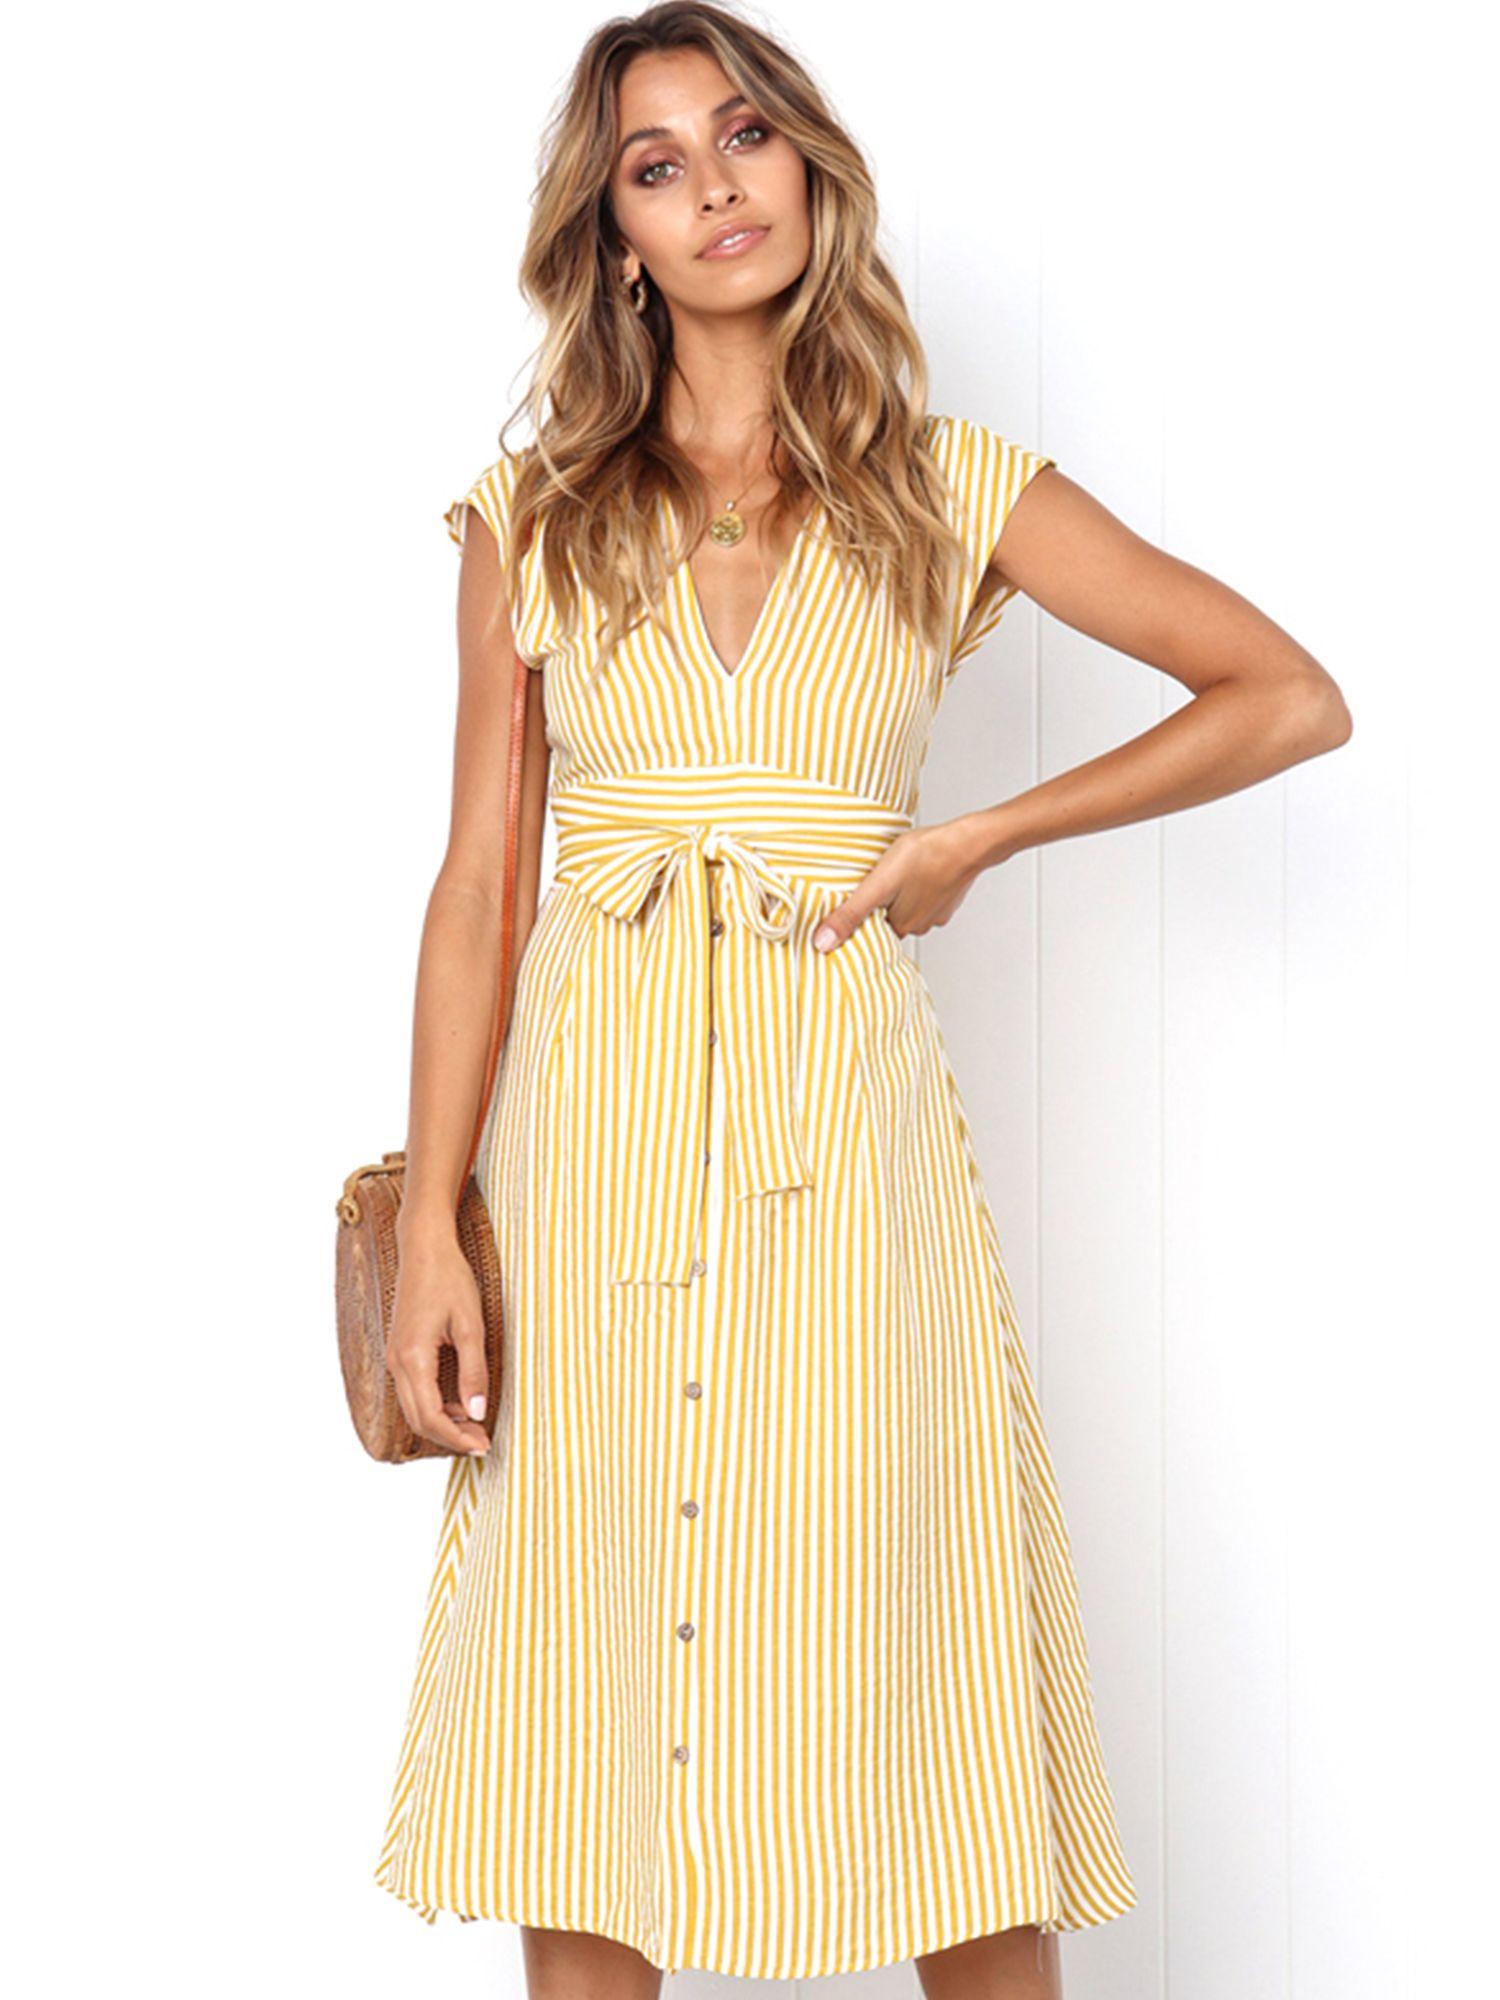 Wodstyle Women S Sleeveless V Neck Casual Party Beach Midi Dress Walmart Com Striped Midi Dress Midi Dress Casual Dresses [ 2000 x 1500 Pixel ]